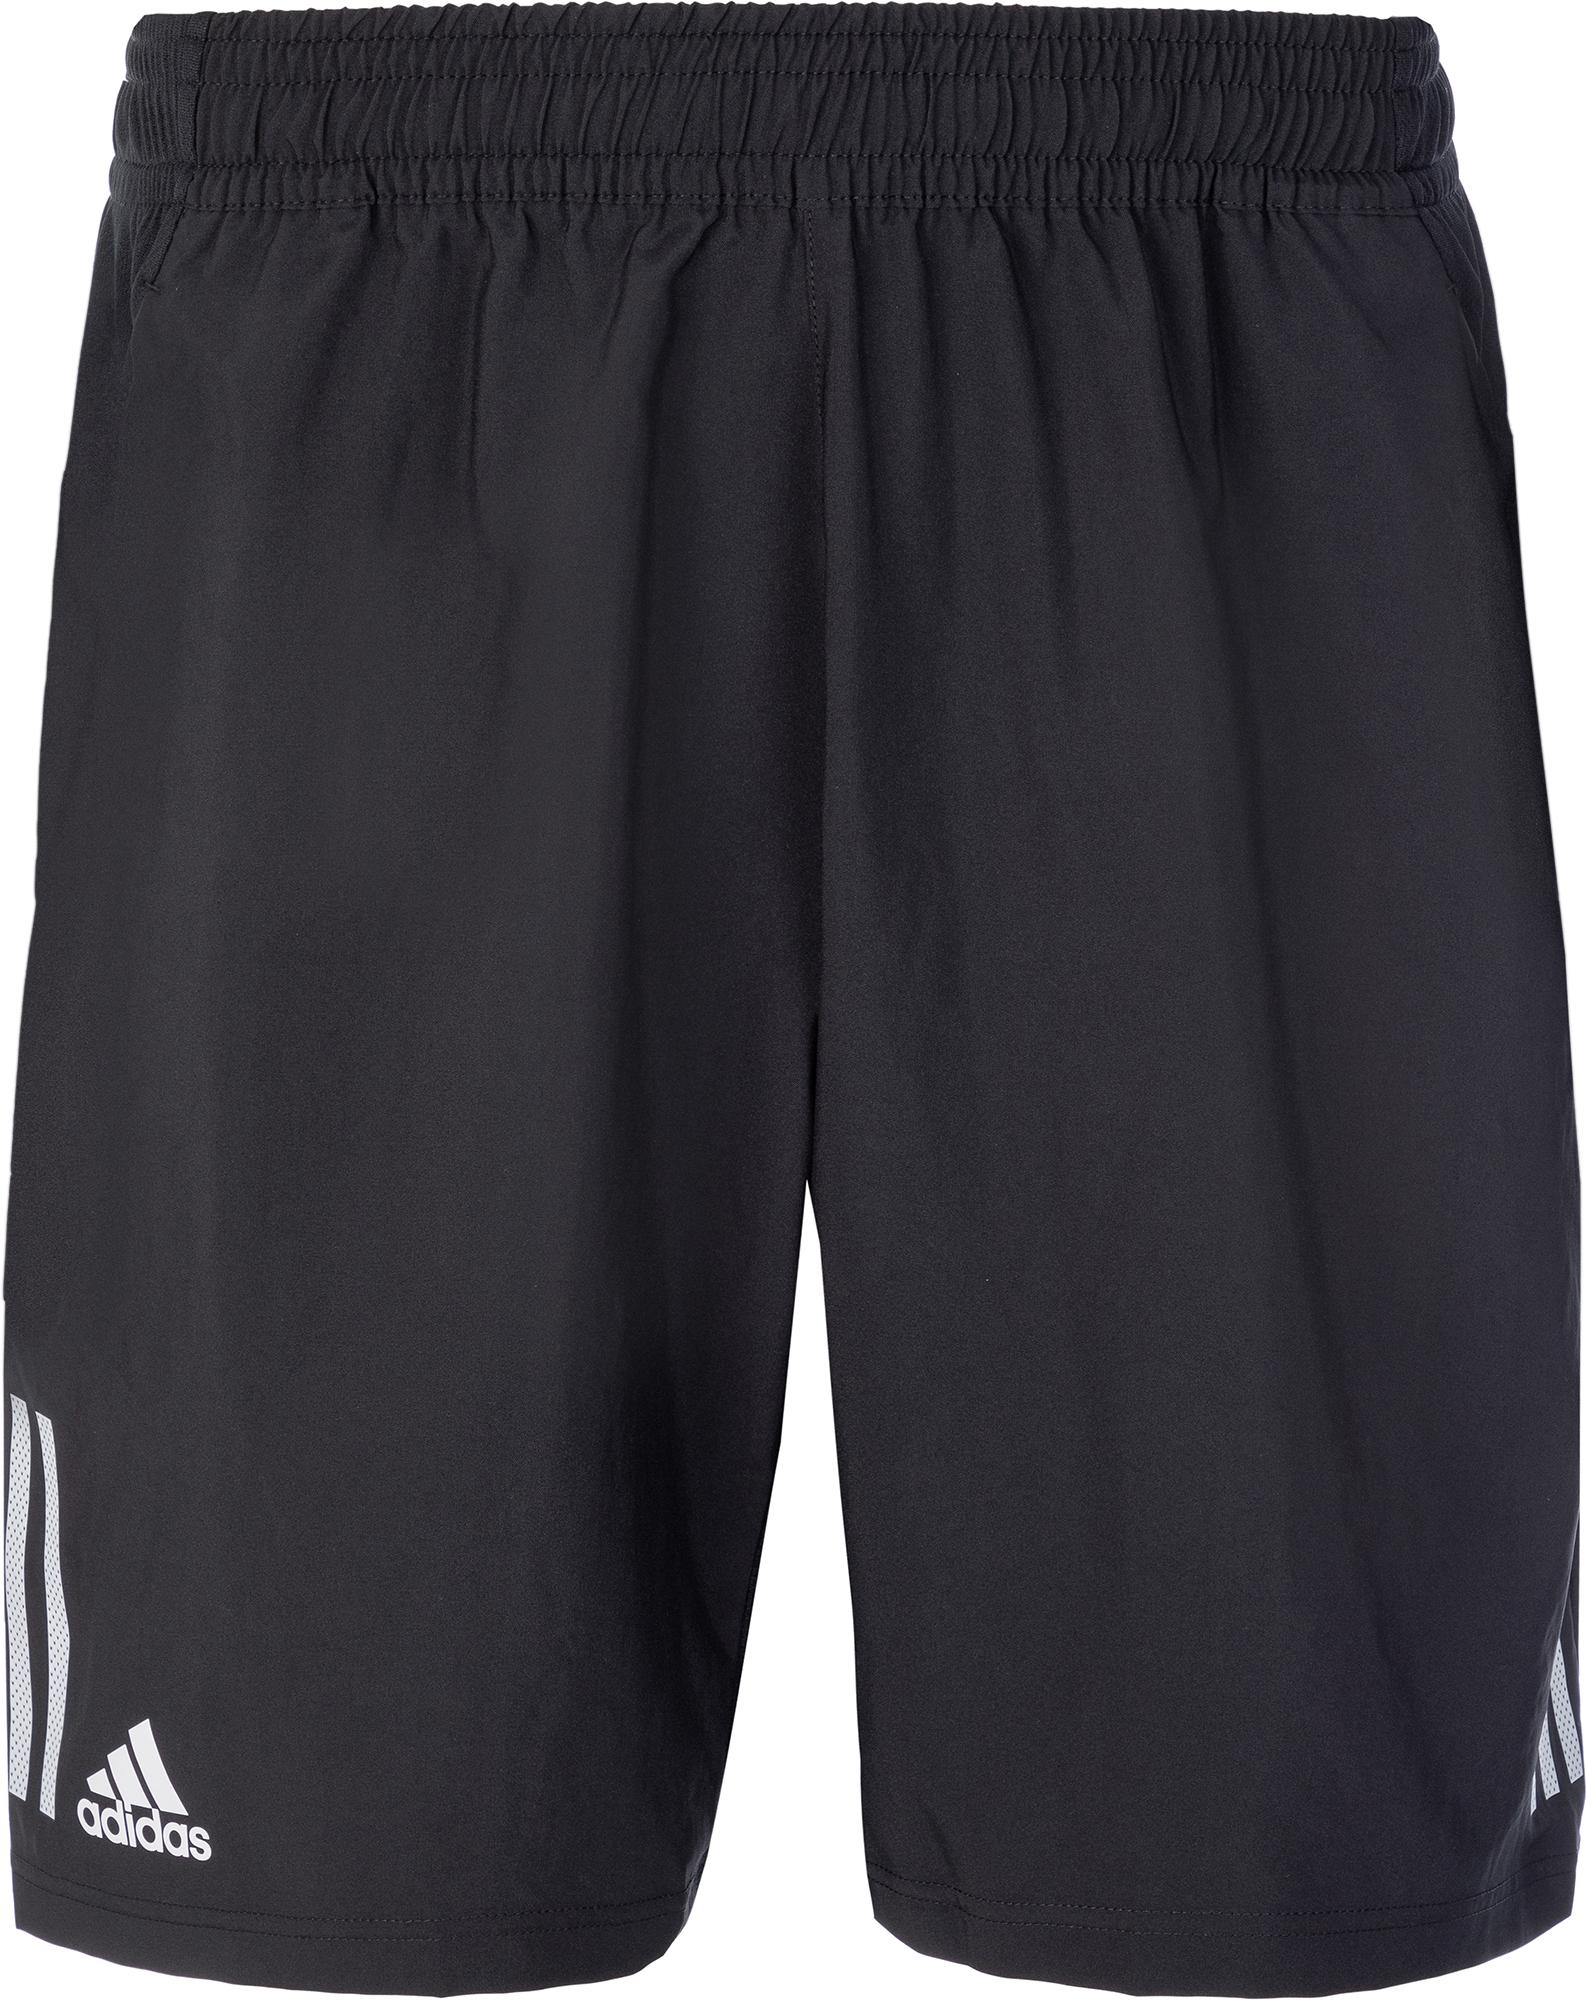 Adidas Шорты мужские Adidas 3-Stripes 9-Inch, размер 44-46 шорты для тенниса мужские adidas uncontrol climachill цвет черный b45842 размер l 52 54